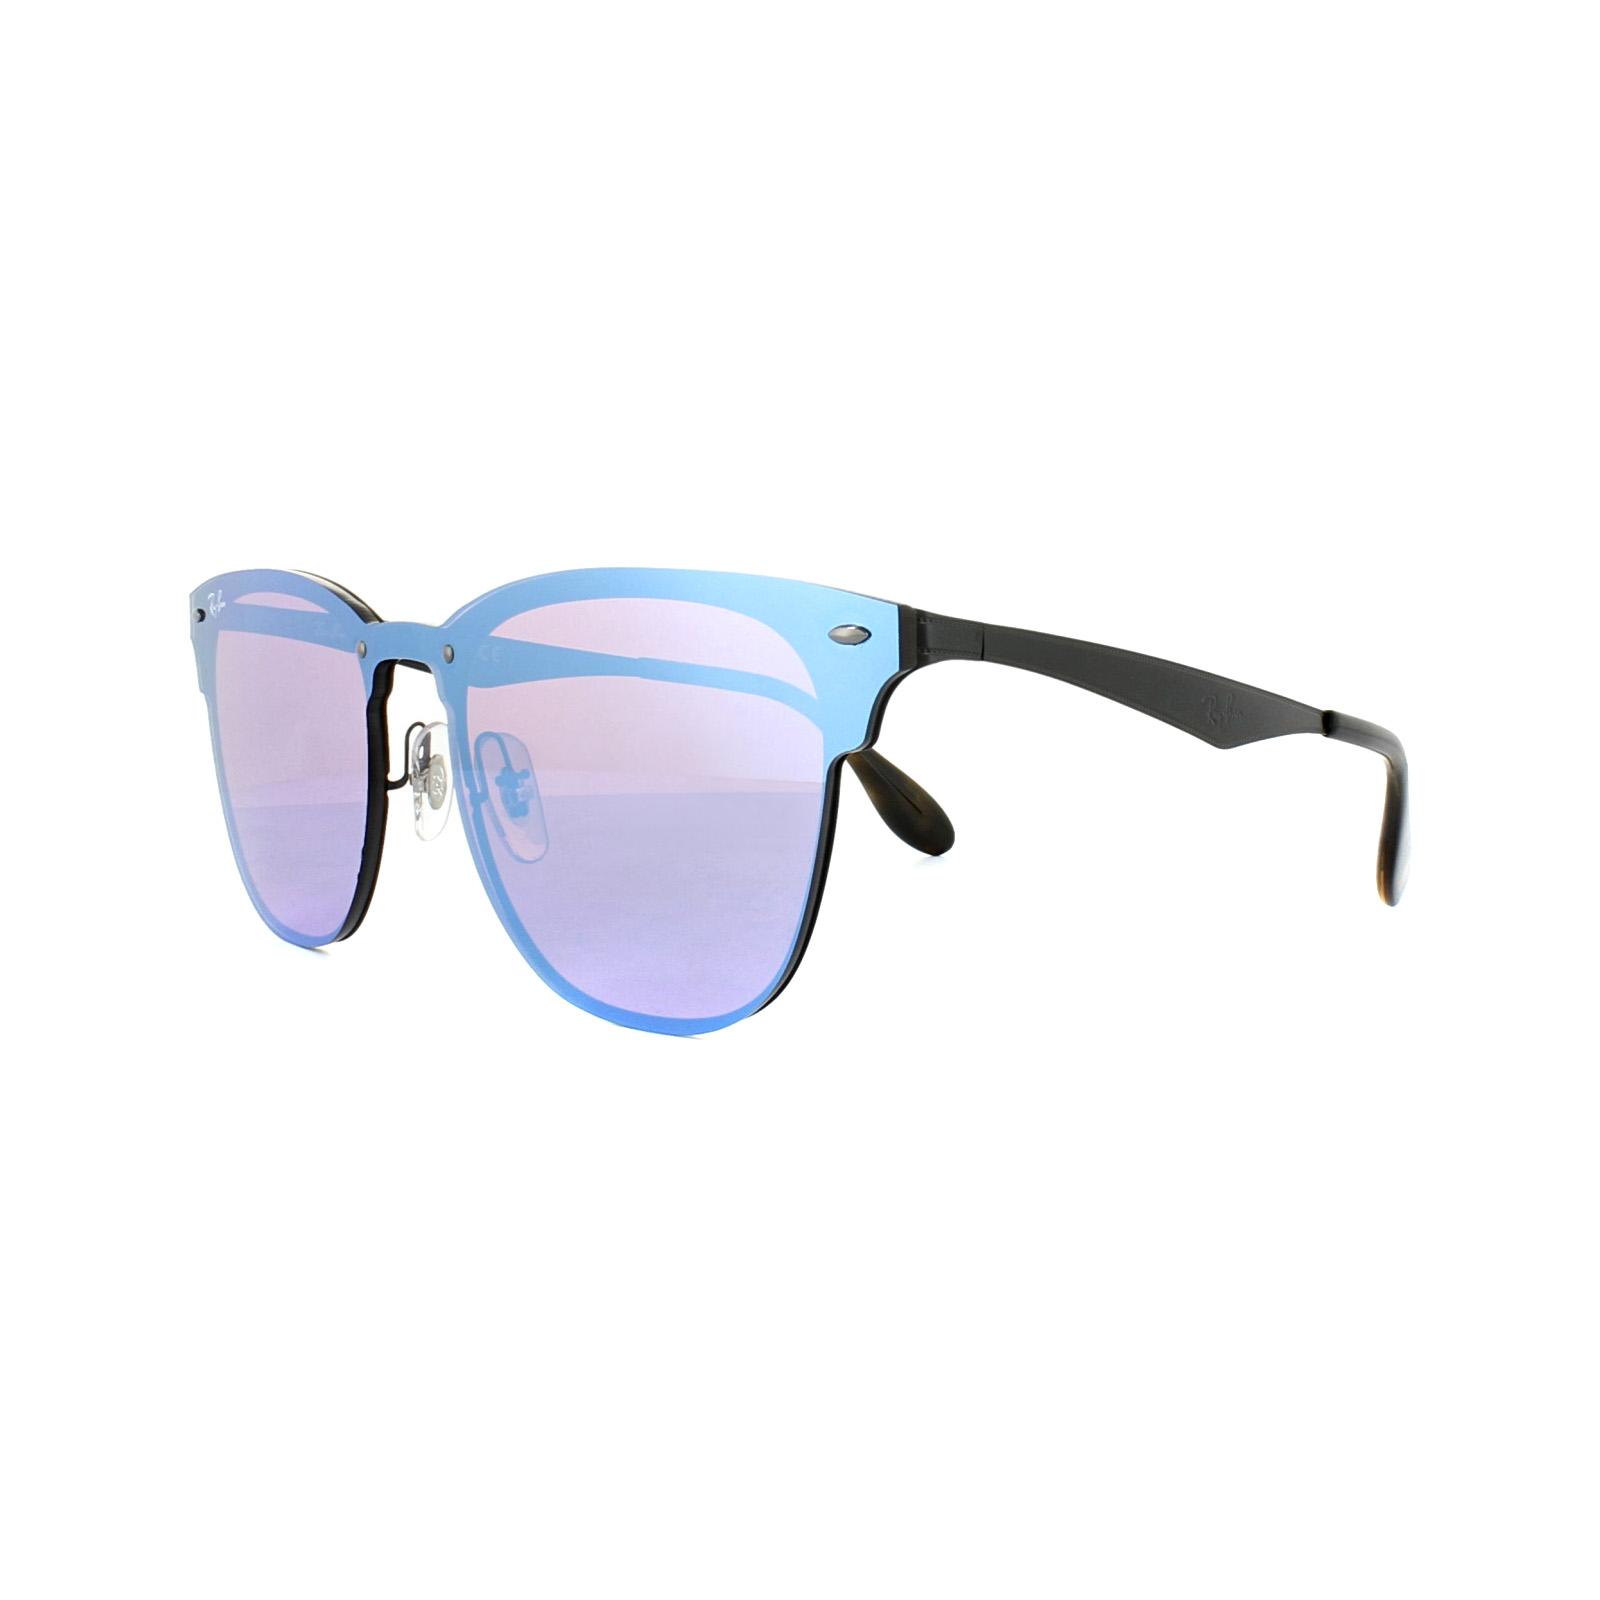 b4c59408413 Sentinel Ray-Ban Sunglasses Blaze Clubmaster 3576N 153 7V Black Dark Violet  Blue Mirror